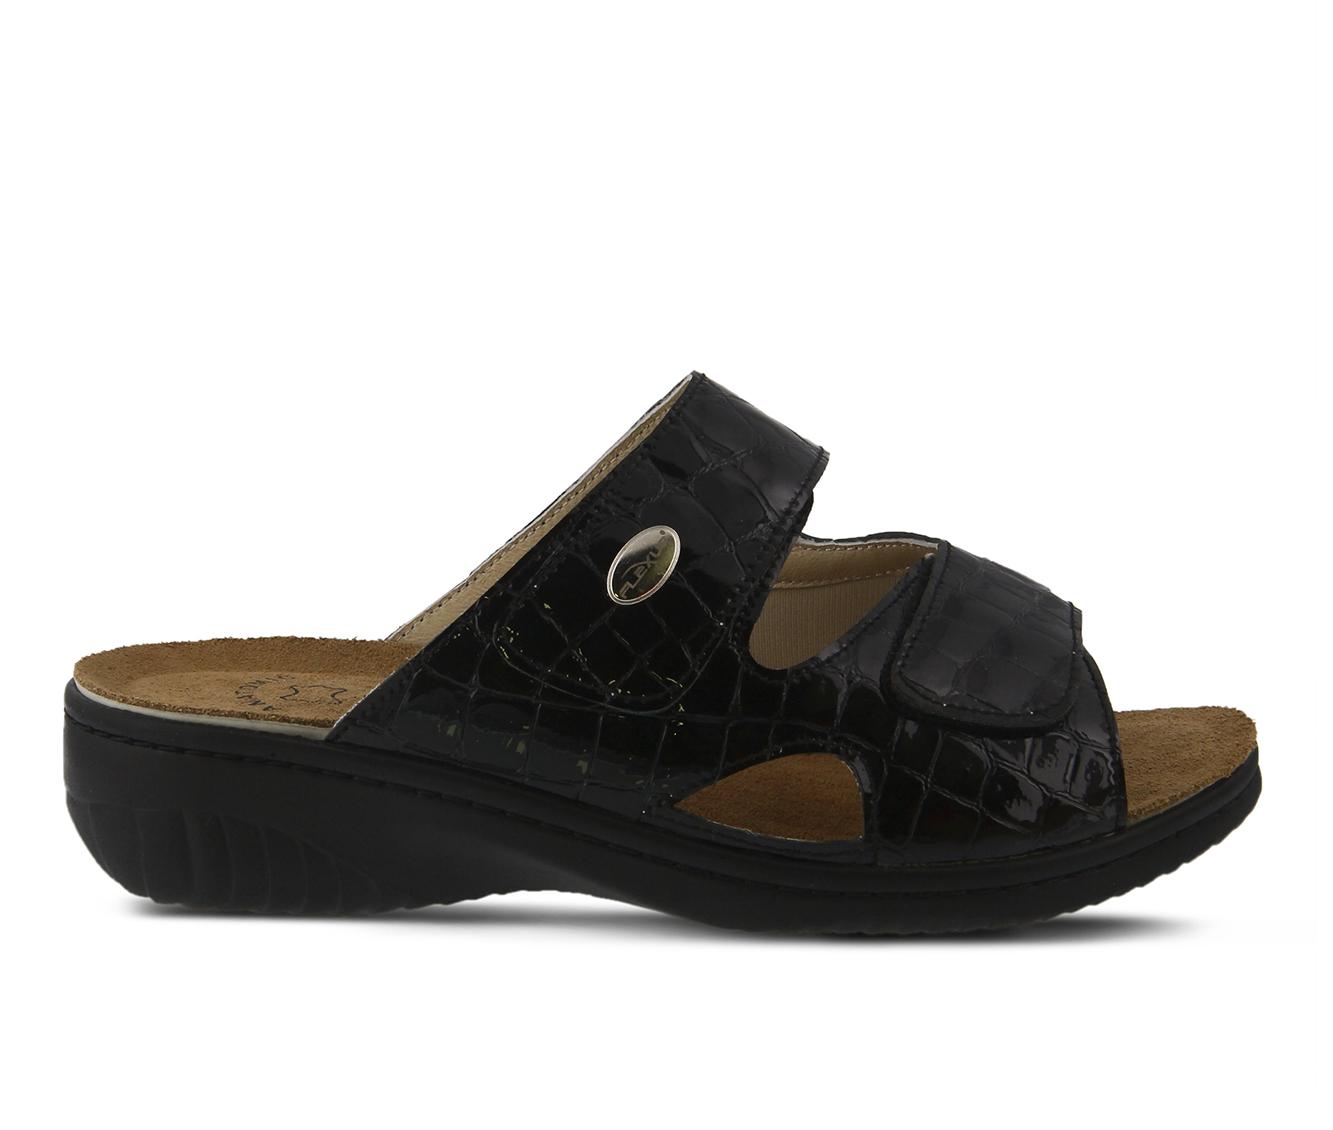 Flexus Almeria Women's Sandal (Black Leather)